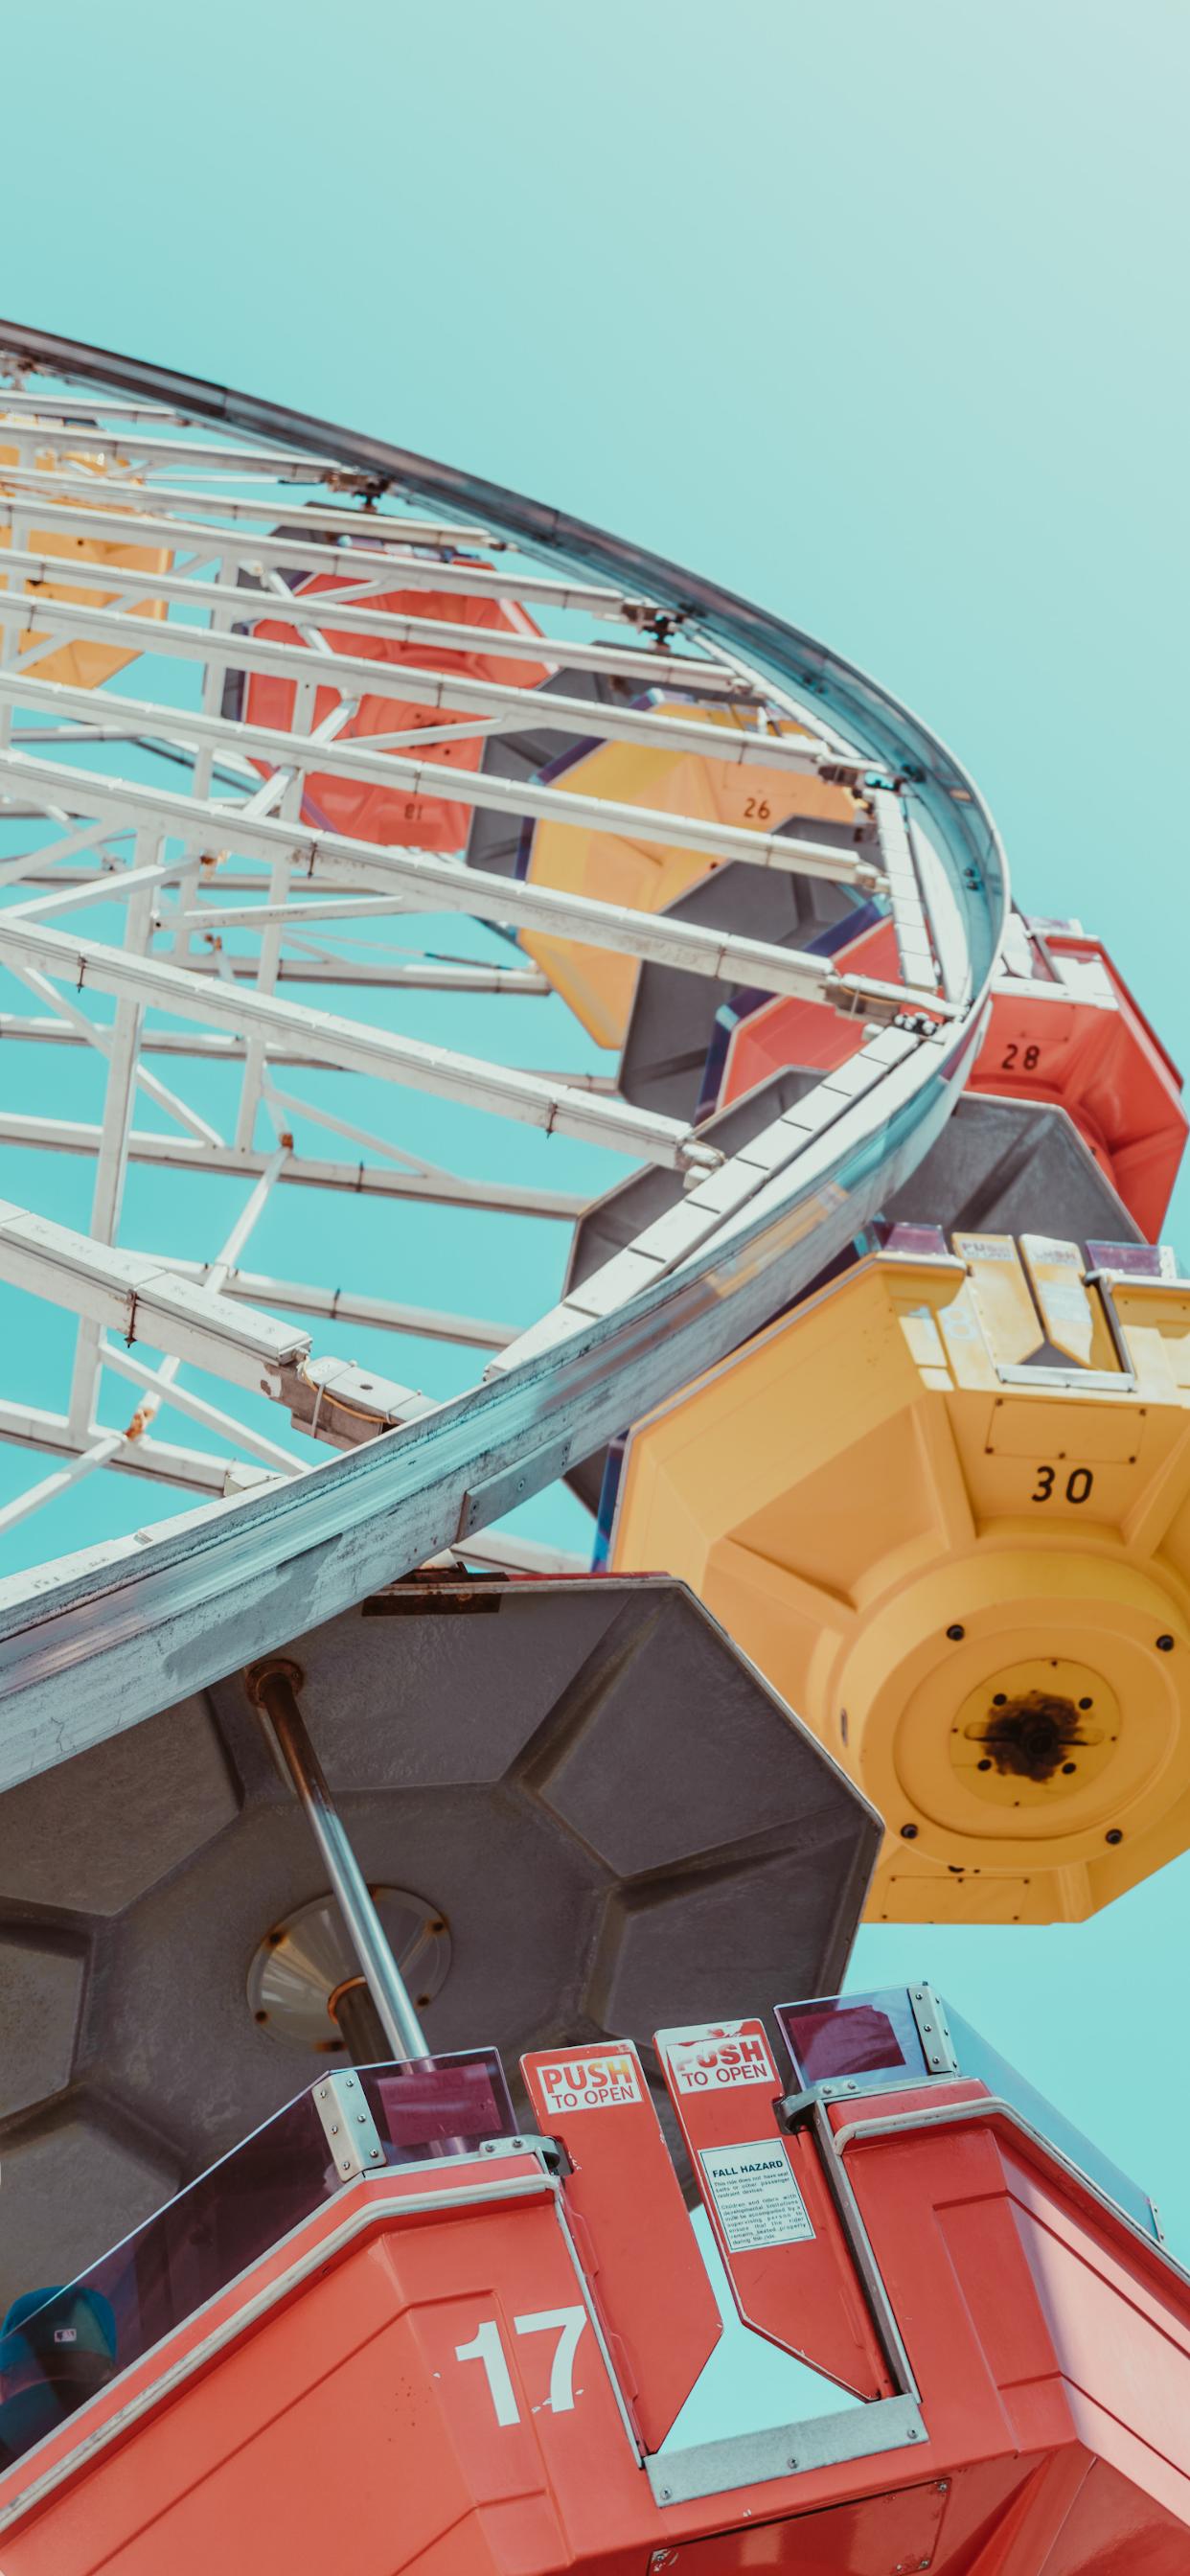 iPhone wallpapers ferris wheel yellow orange Ferris Wheel